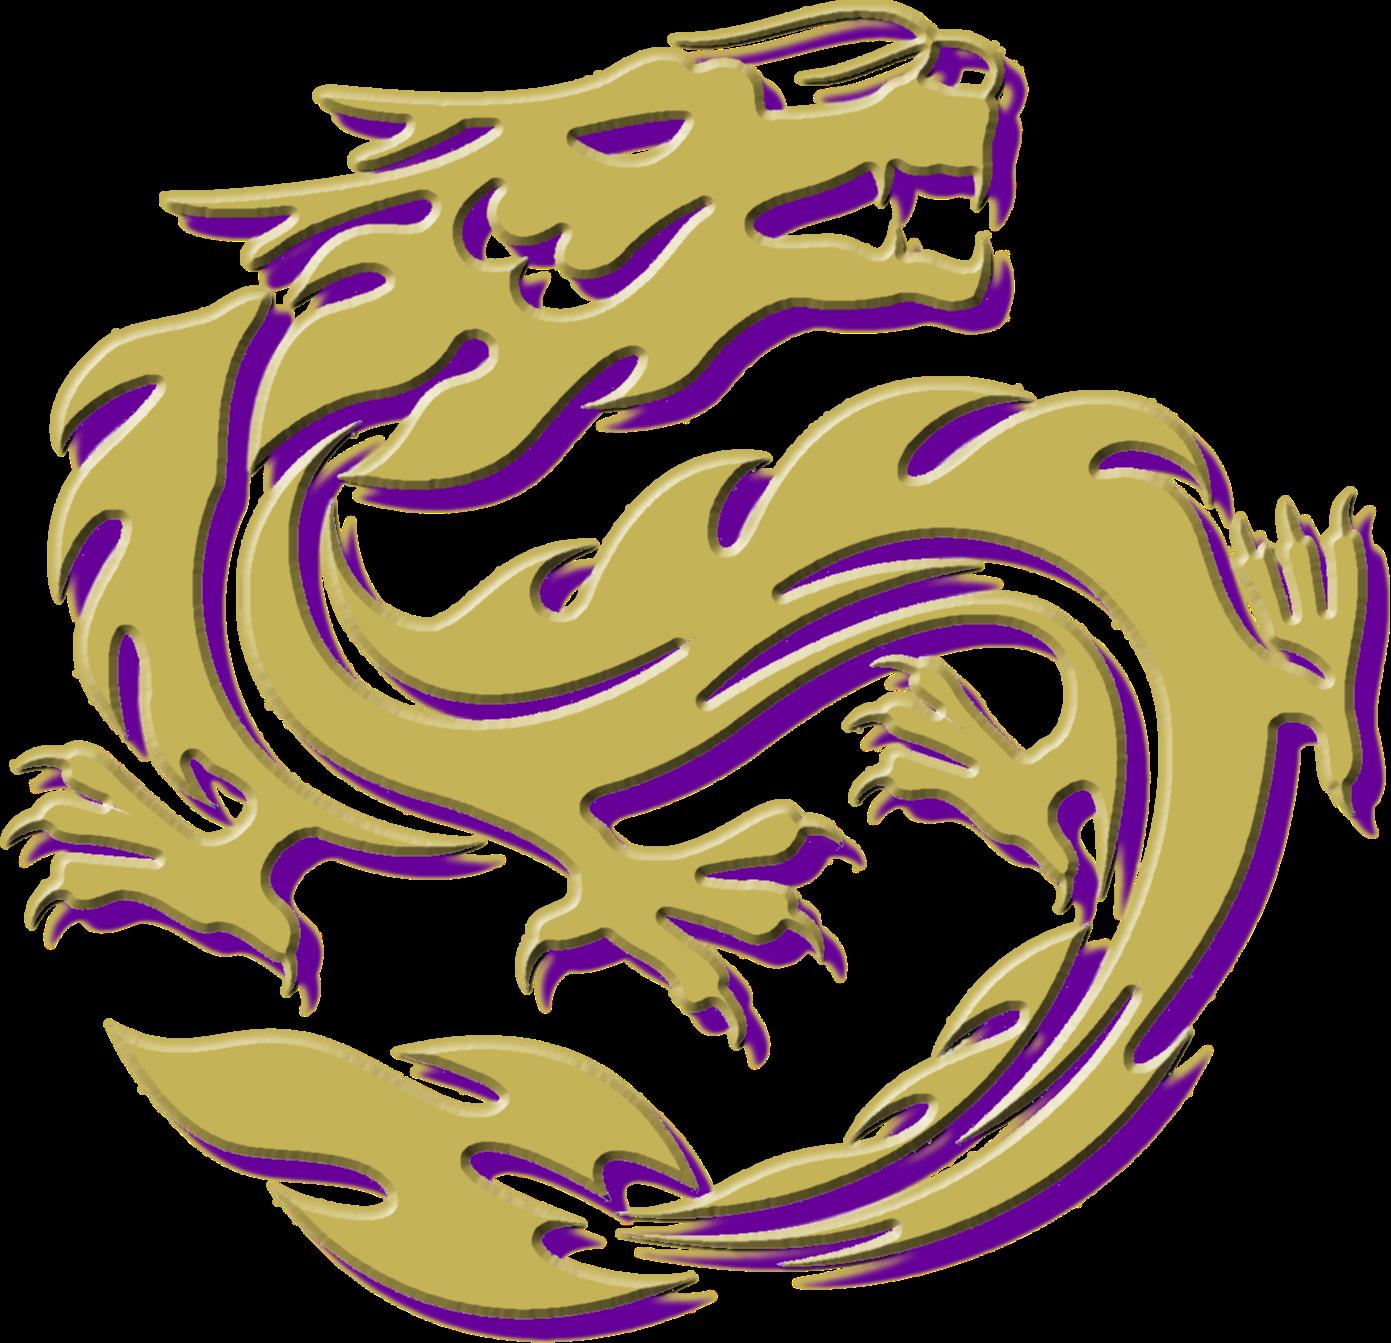 JC Dragons